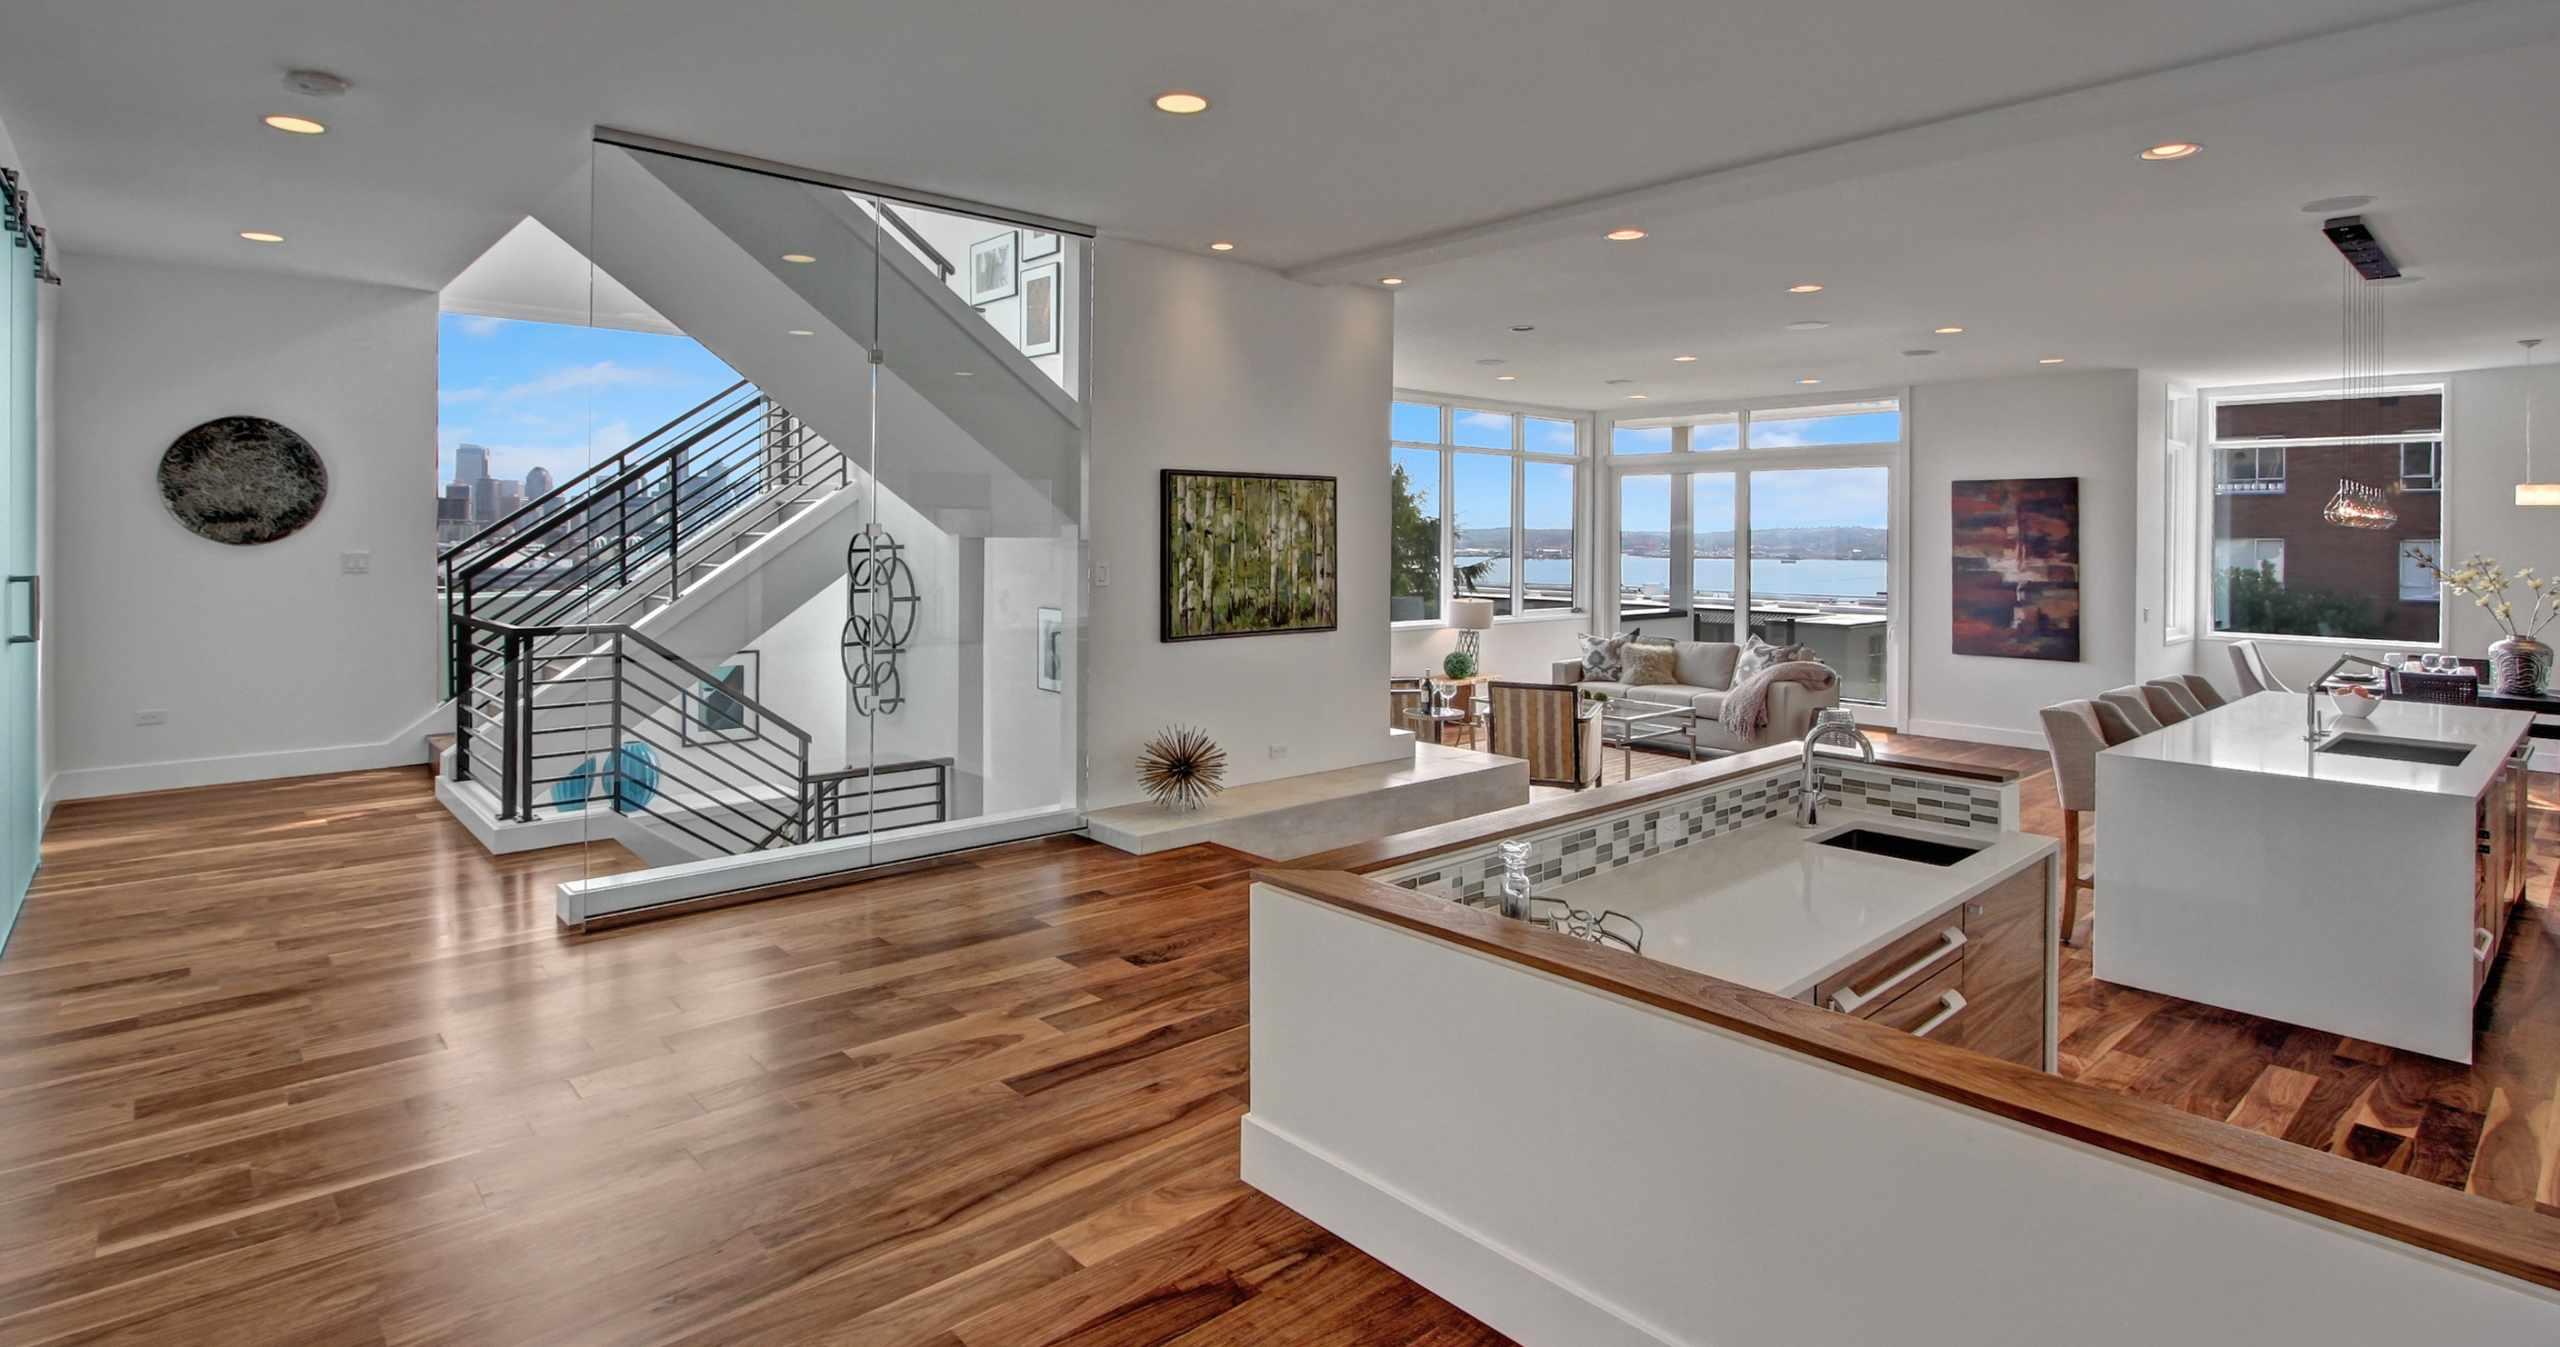 Modern Living, Glass Curtain Wall, Hardwood Floors, Open Floor Plan